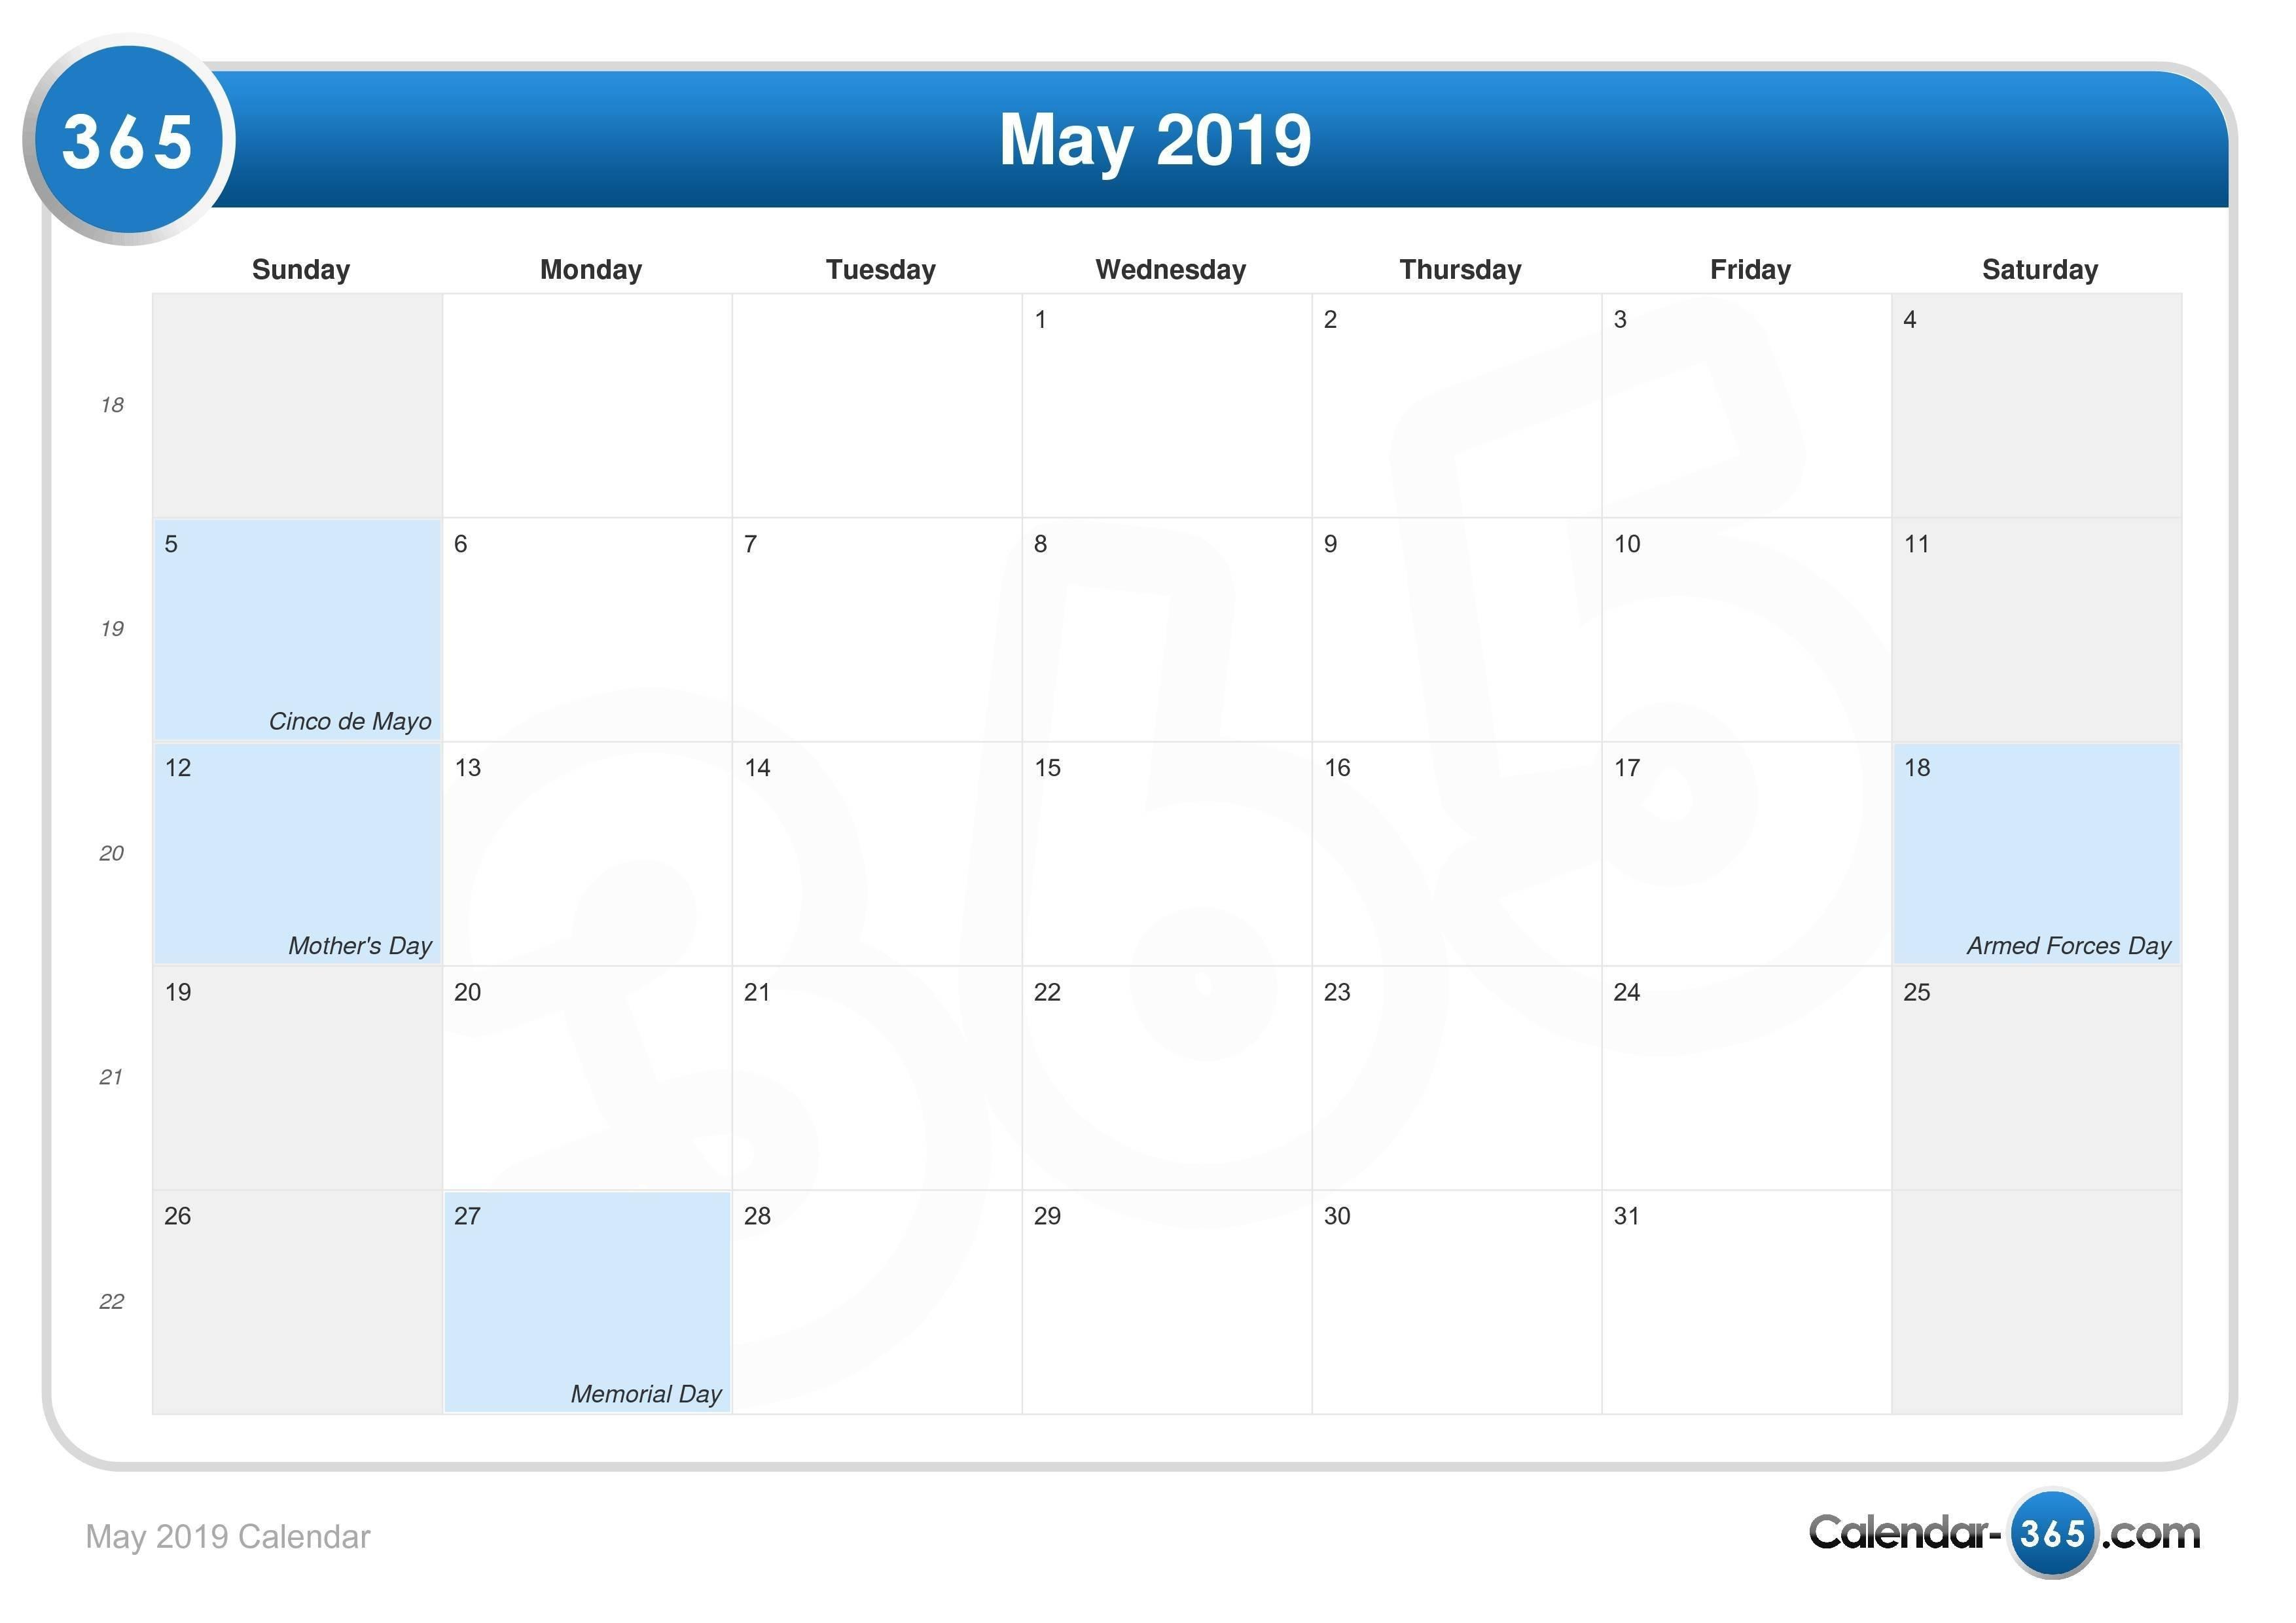 May 2019 Calendar Calendar 1/2019